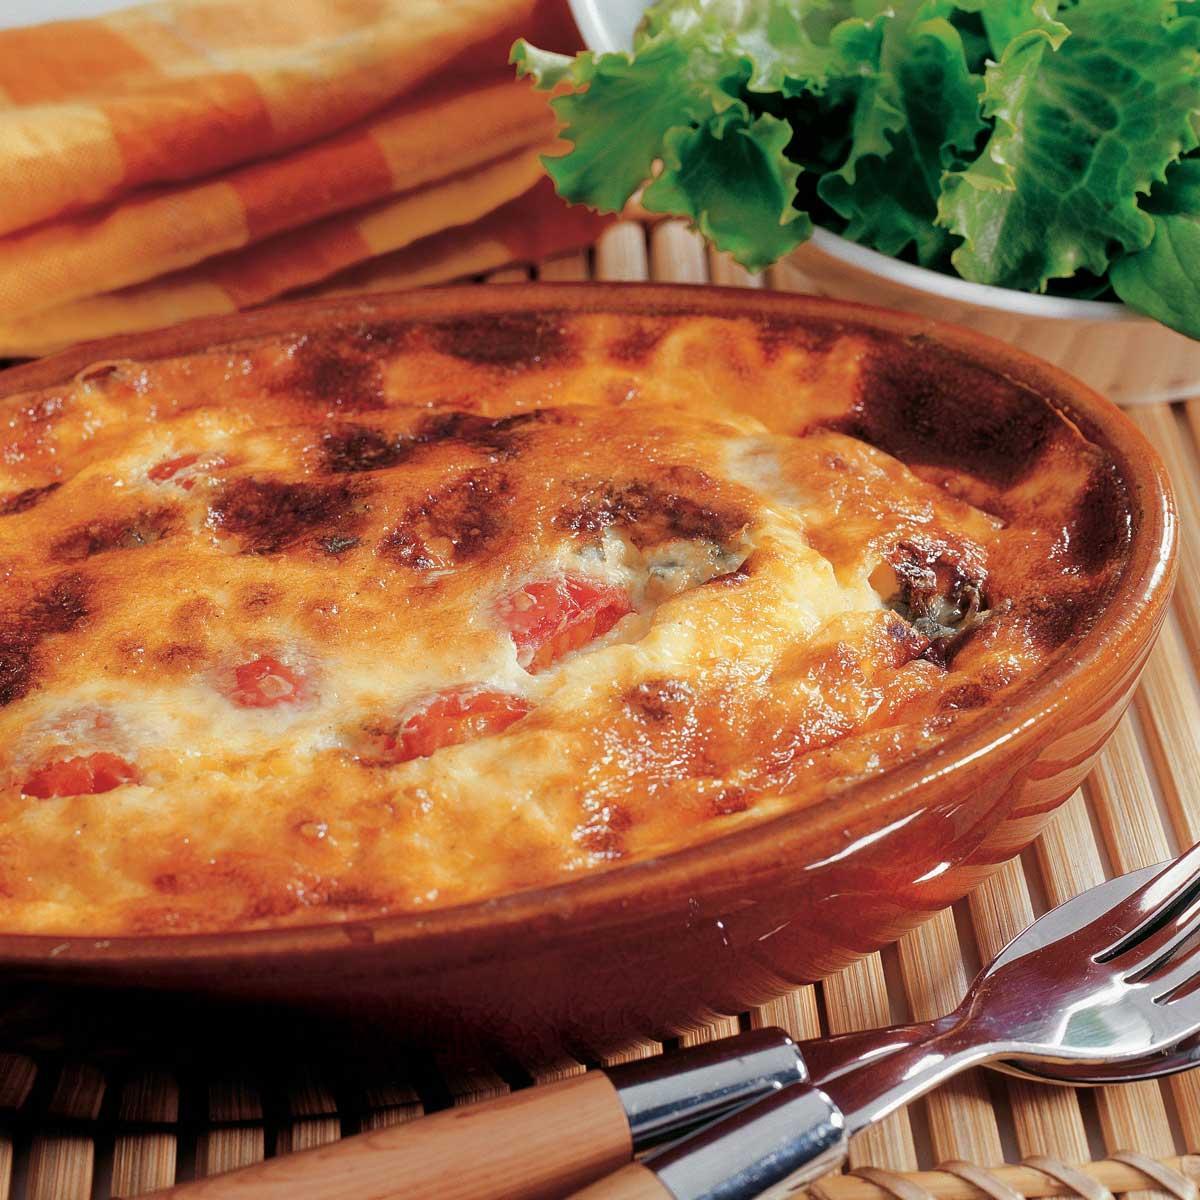 recette clafoutis de tomates cerises cuisine madame figaro. Black Bedroom Furniture Sets. Home Design Ideas